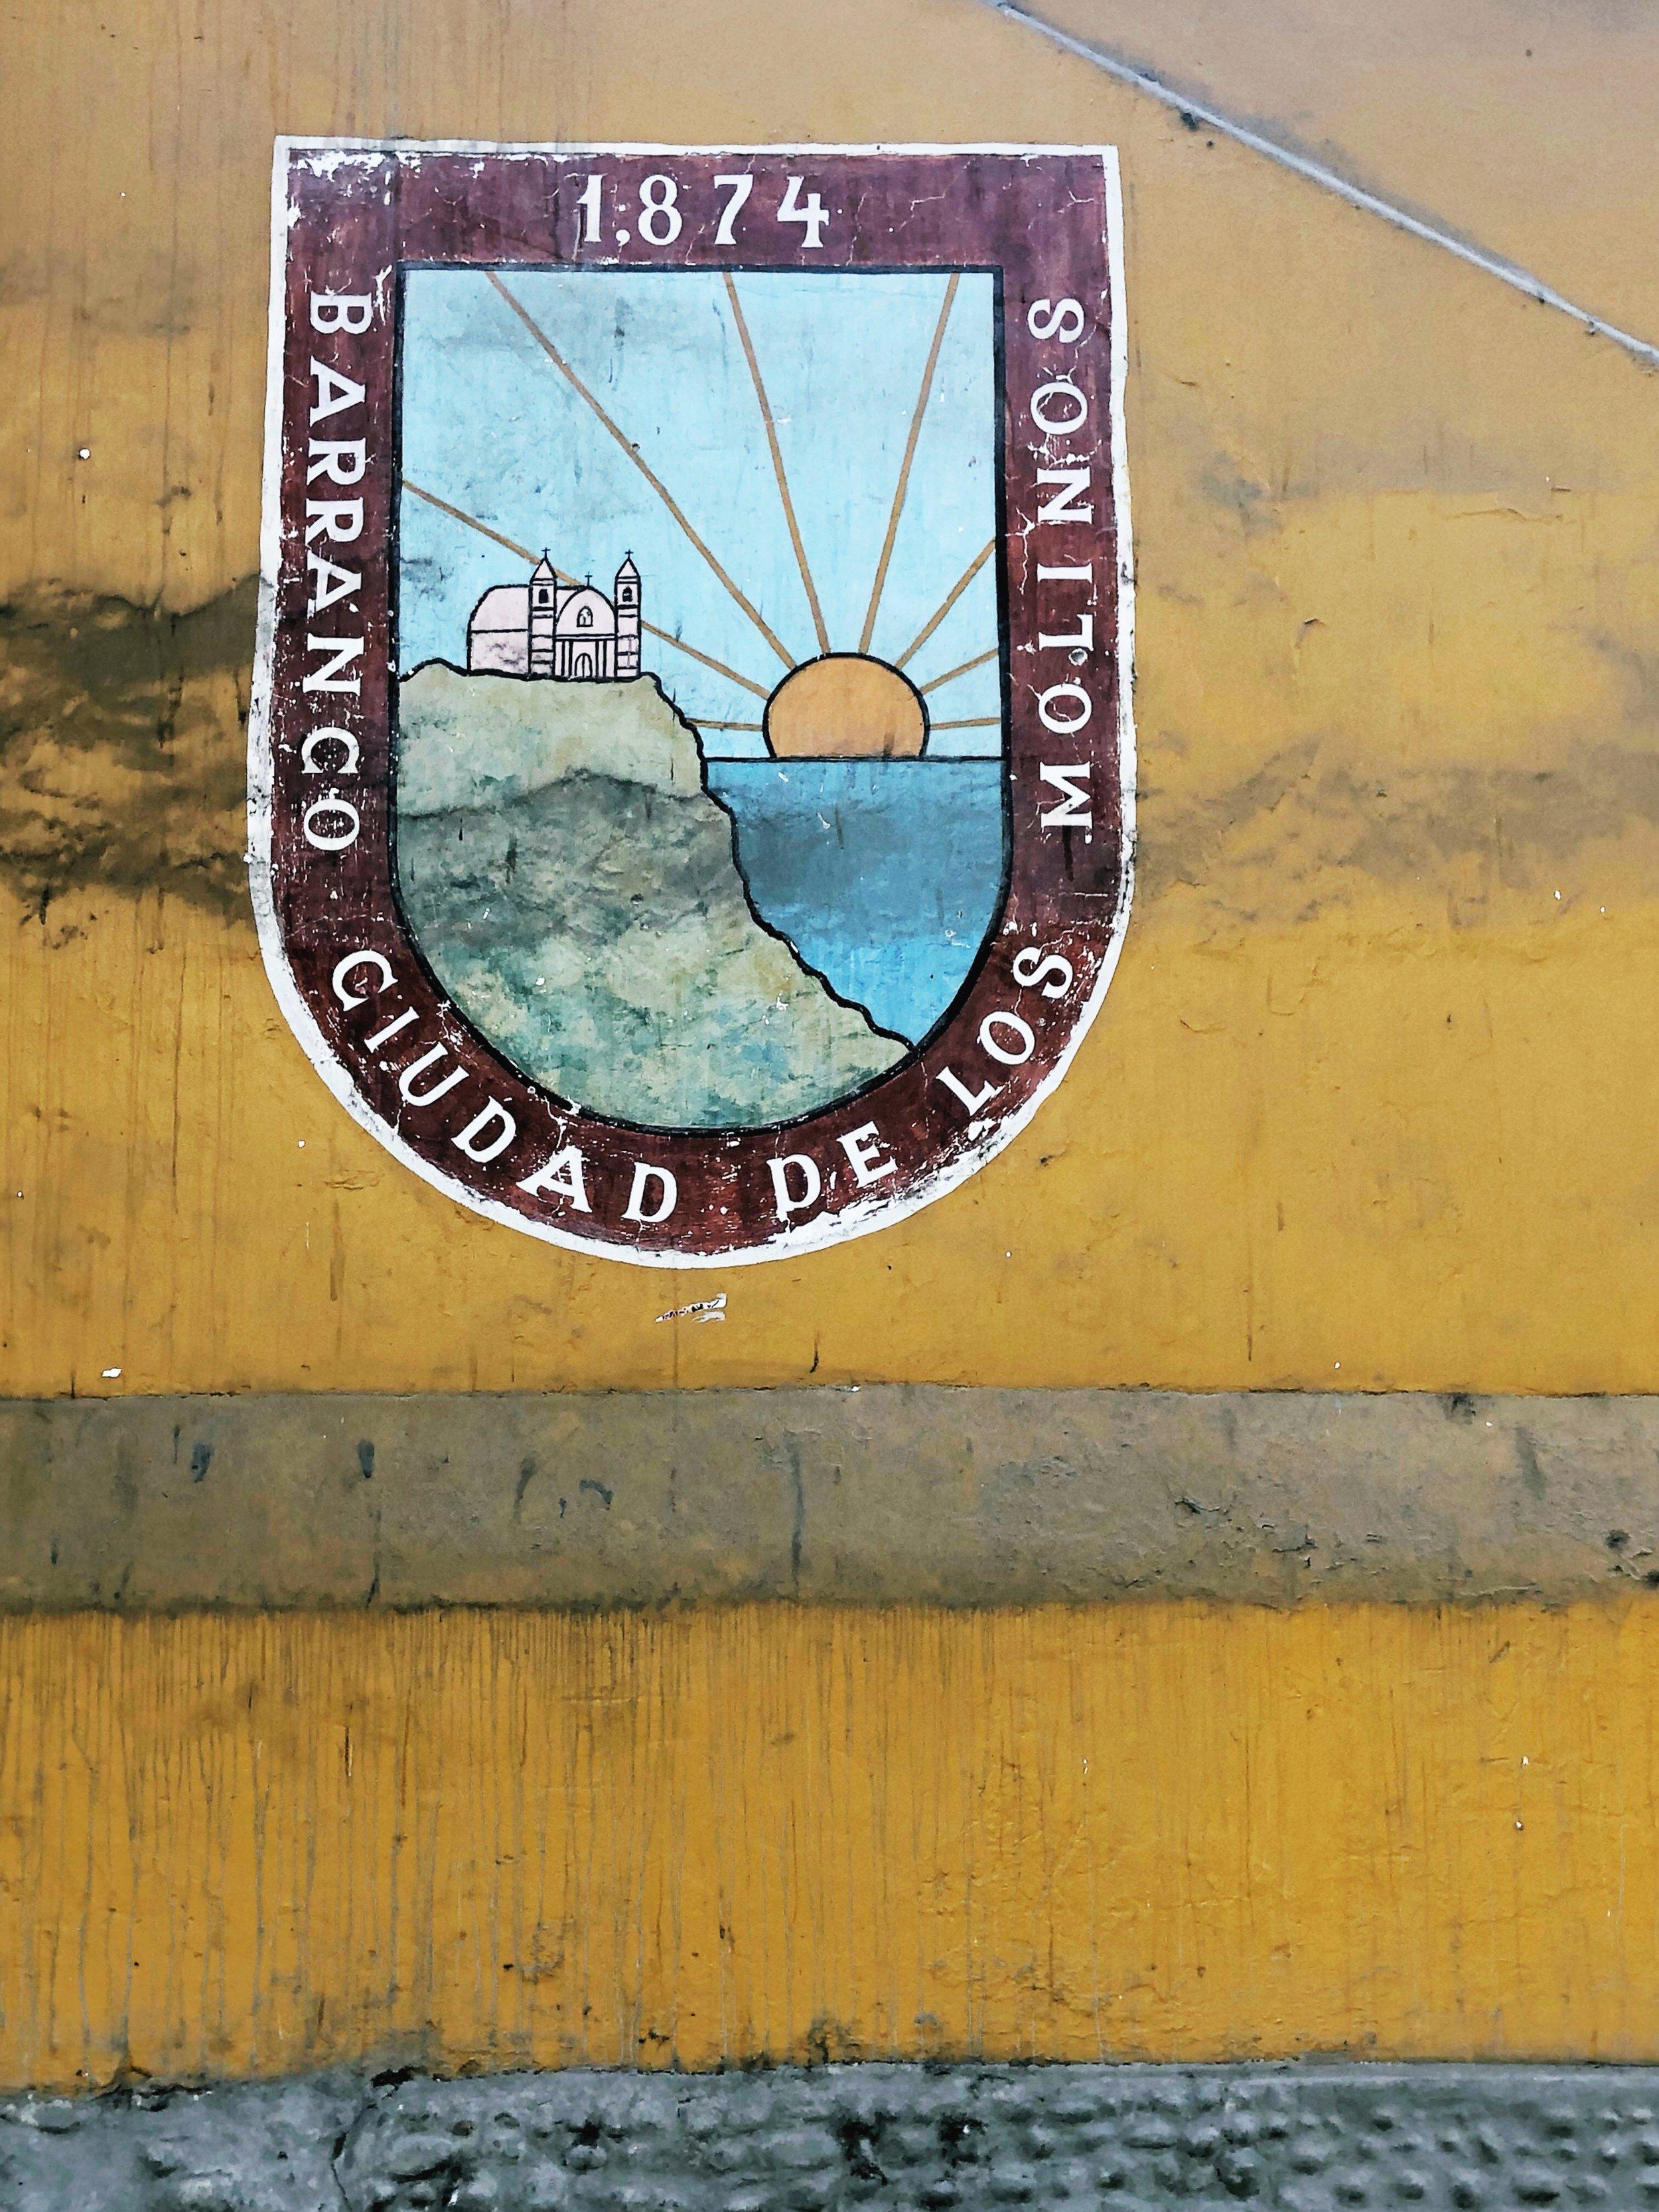 barranco-south america-lima-peru-bridge of sighs-travel tips-graffiti